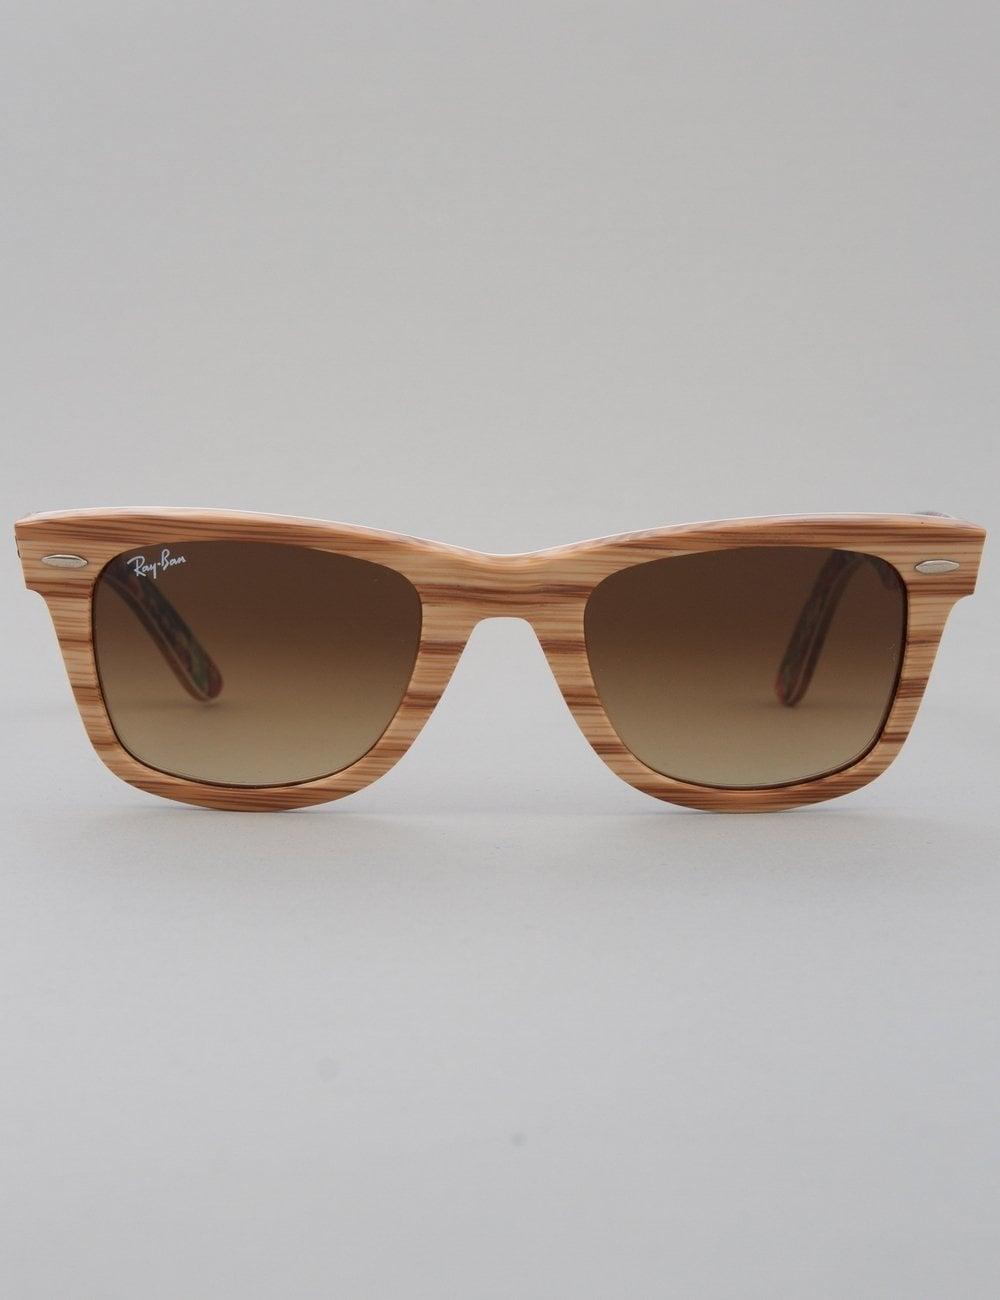 a2257afd66 Ray-Ban Original Wayfarer Sunglasses - Wood Surfs Up    Brown ...